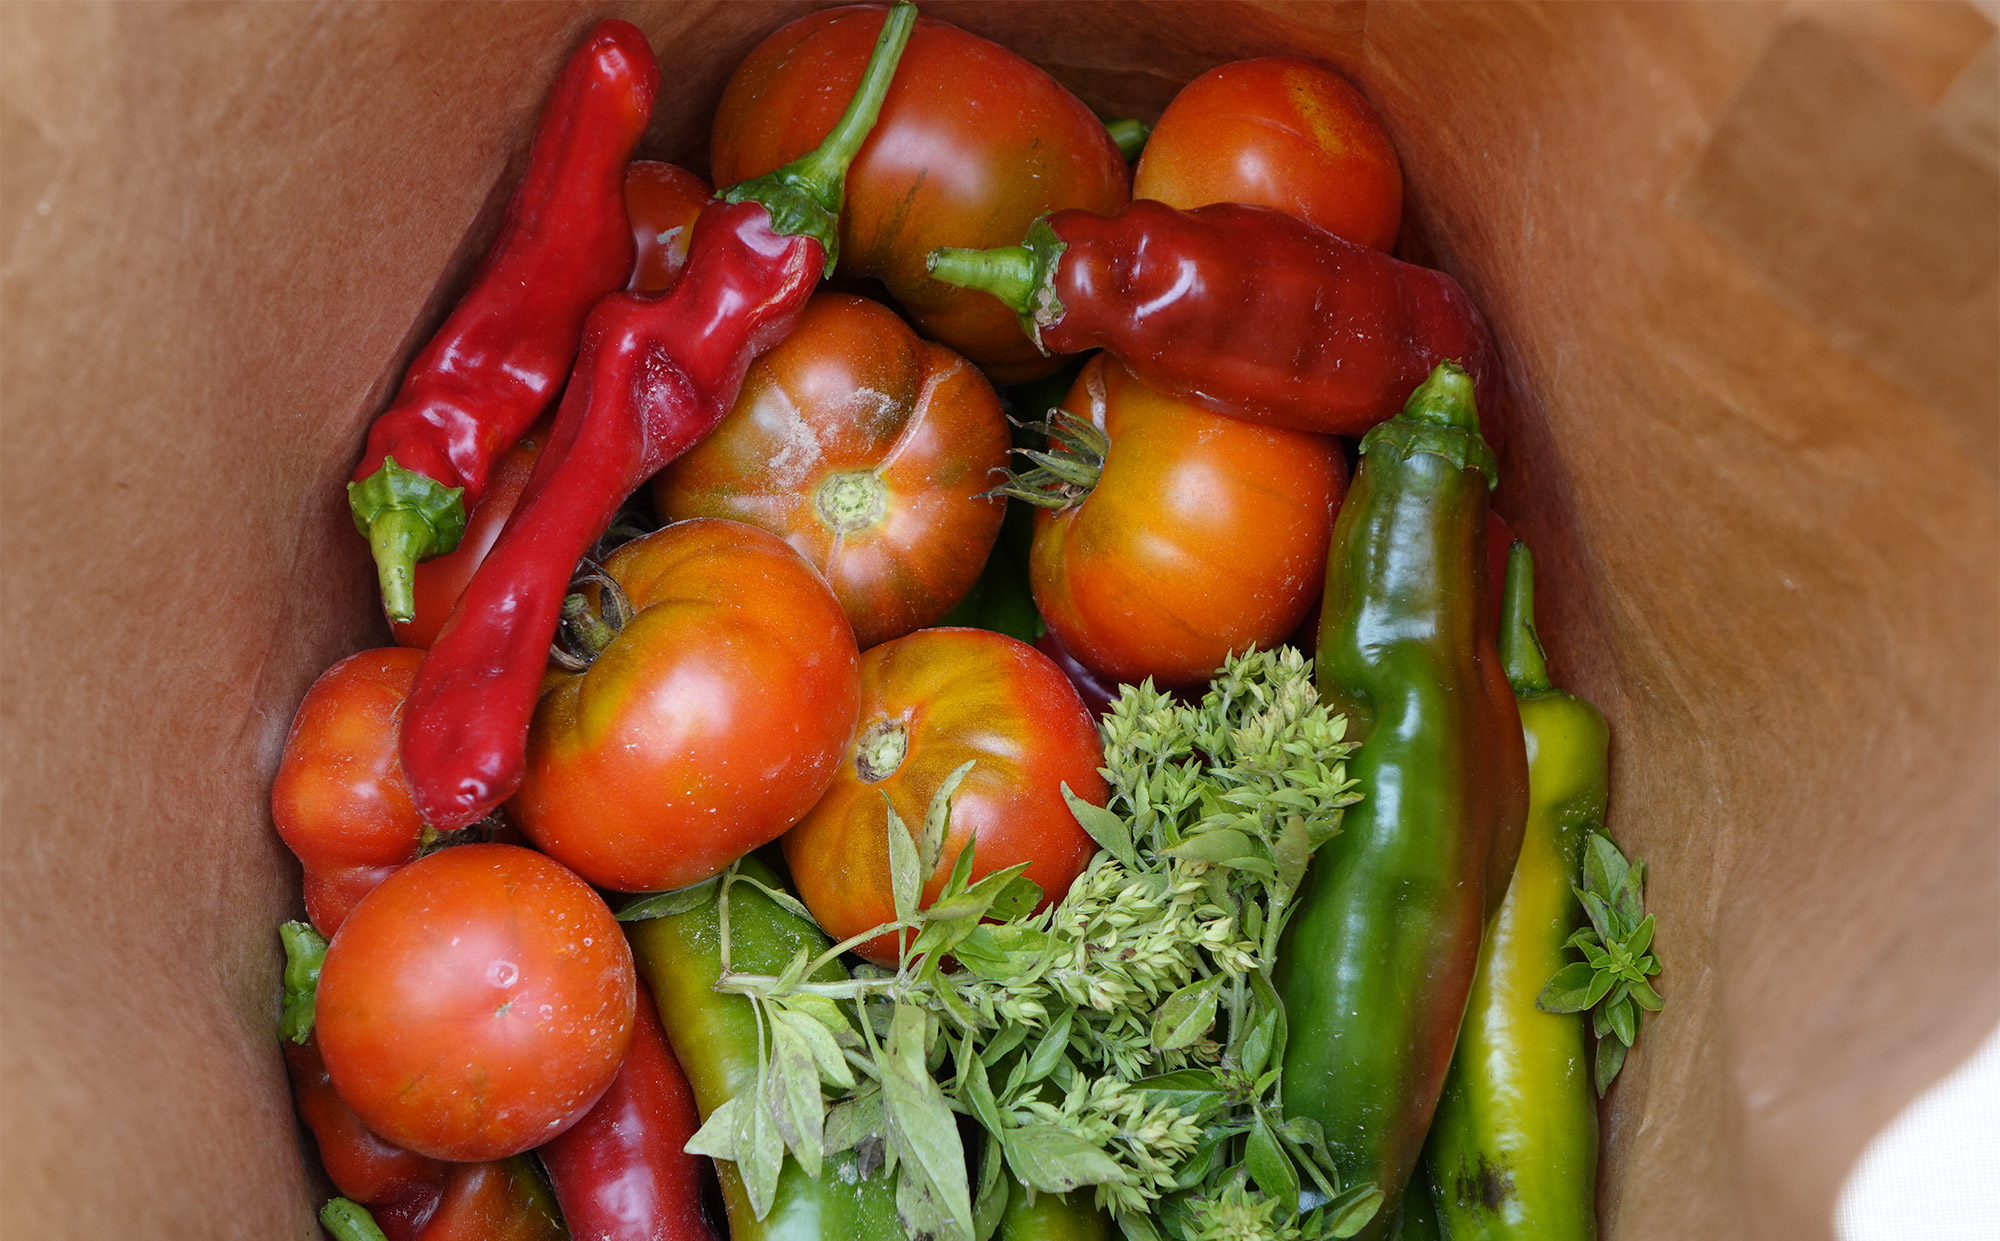 Frisches Gemüse aus dem eigenen Garten schmeckt immer noch am besten